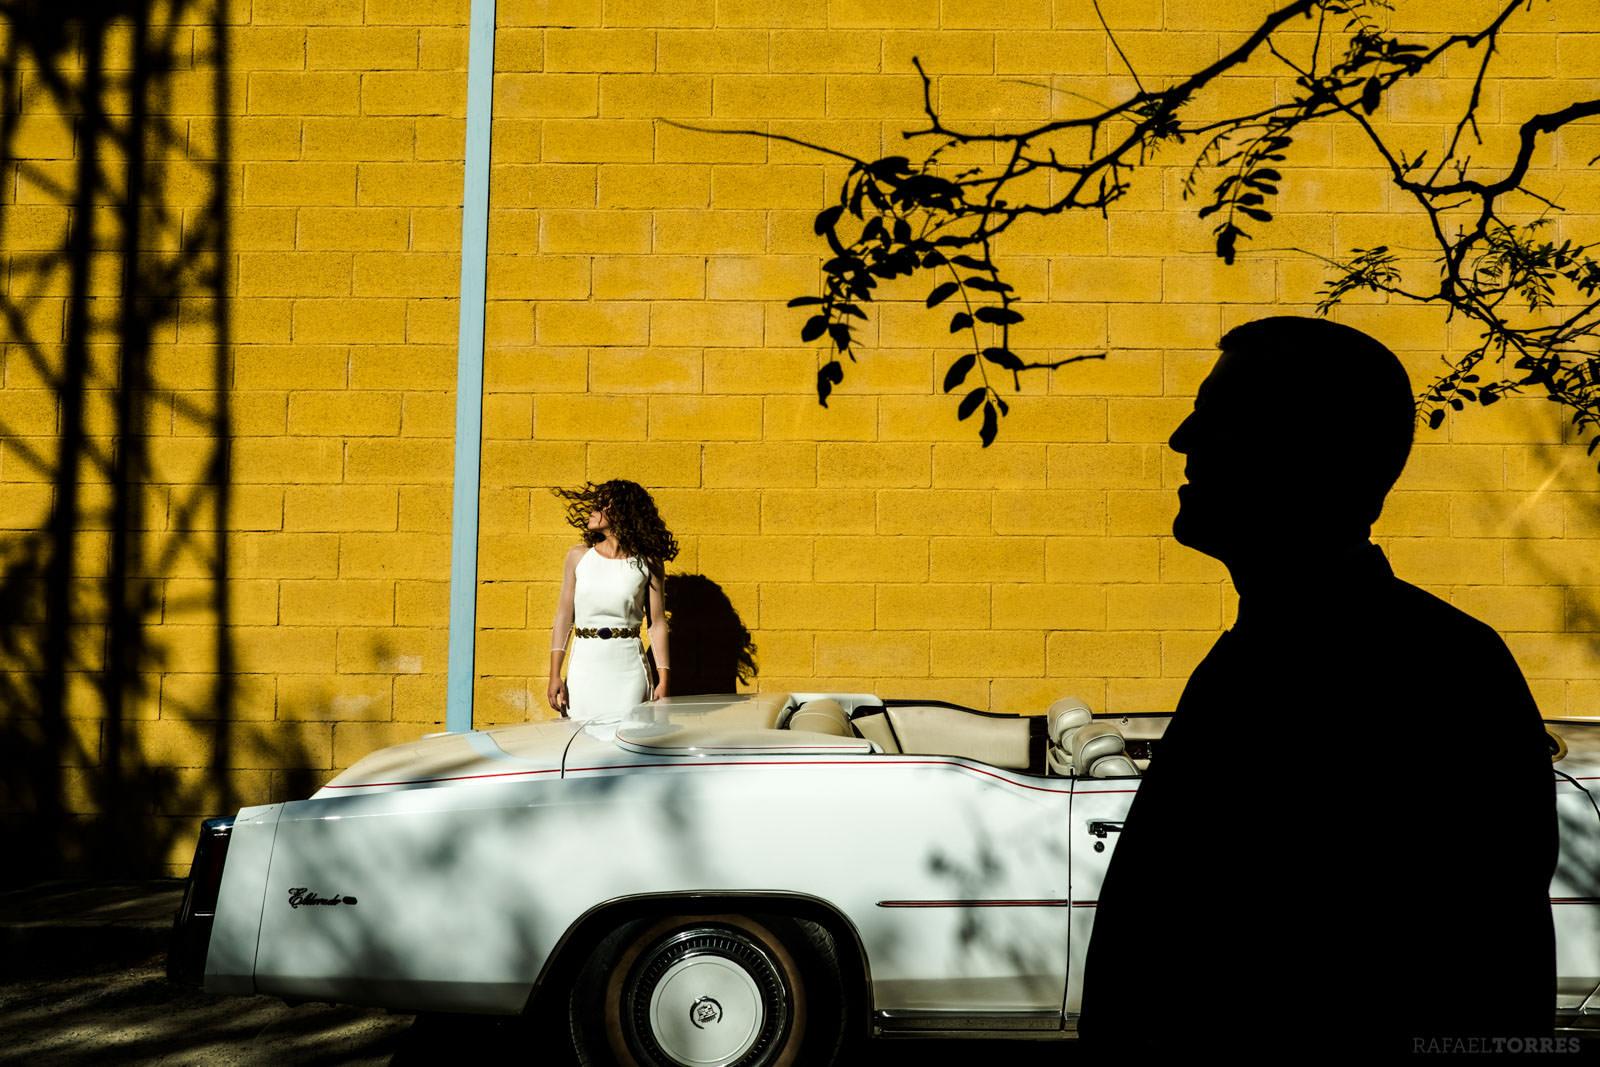 Rafael+Torres+fotografo+bodas+sevilla+madrid+barcelona+wedding+photographer+bodas+diferentes+bodaensevilla+molinillos+fotografo+hacienda+oran+alfonso+wedding+photographer-41.jpg